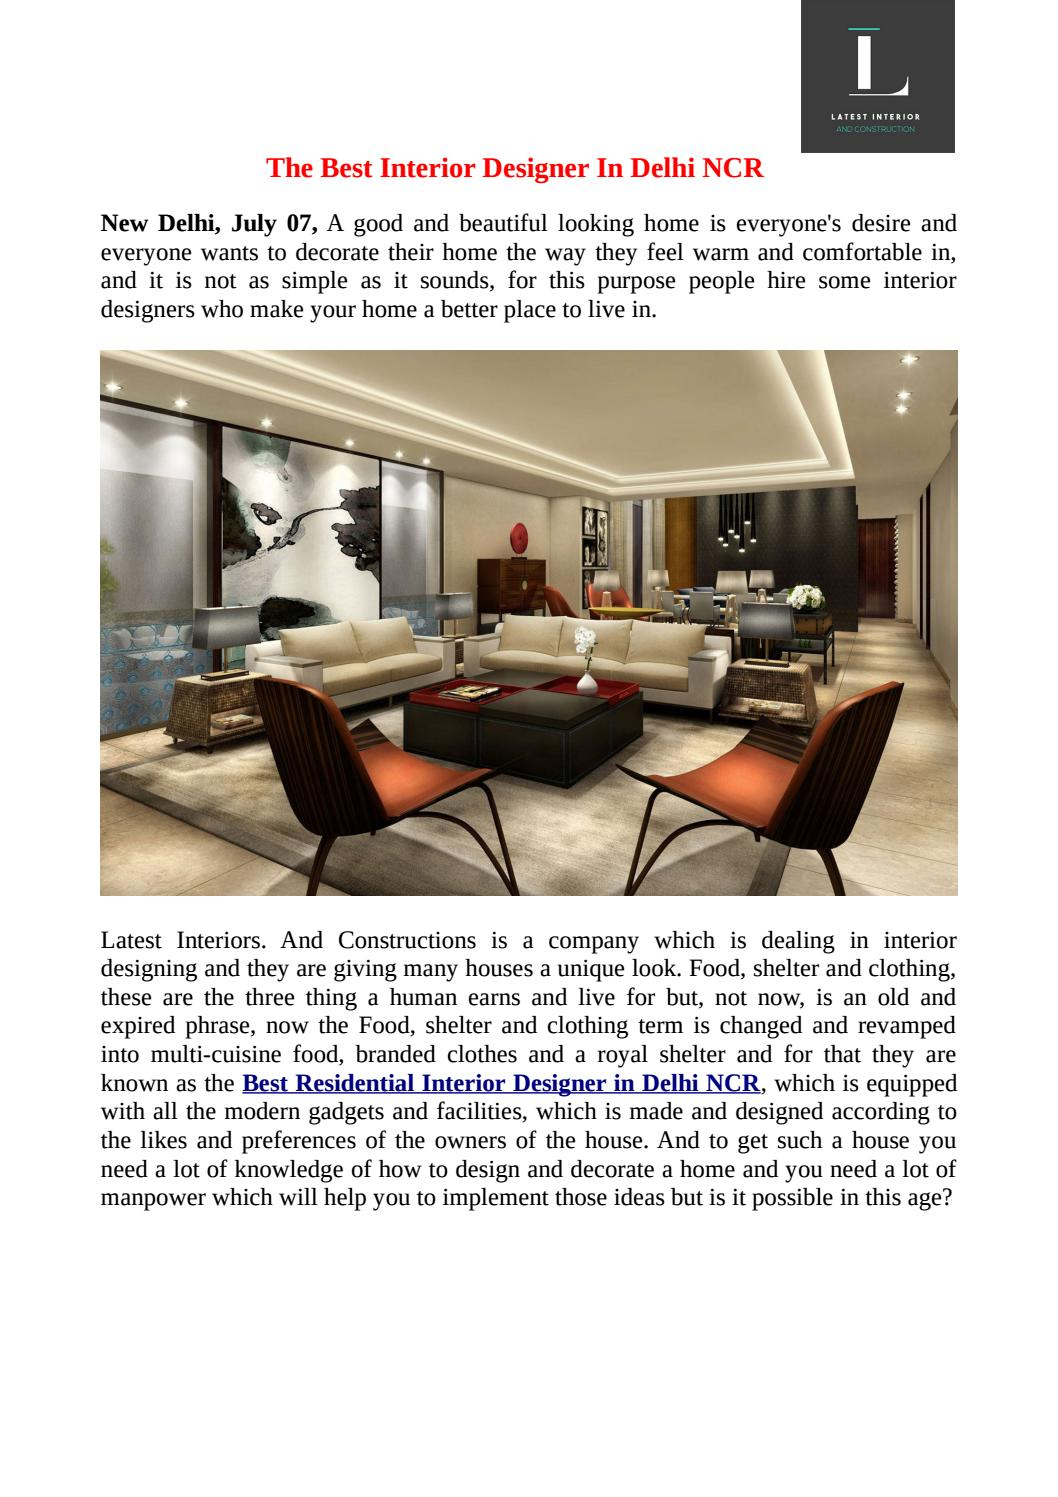 The Best Interior Designer In Delhi Ncr By Latestinteriors Issuu